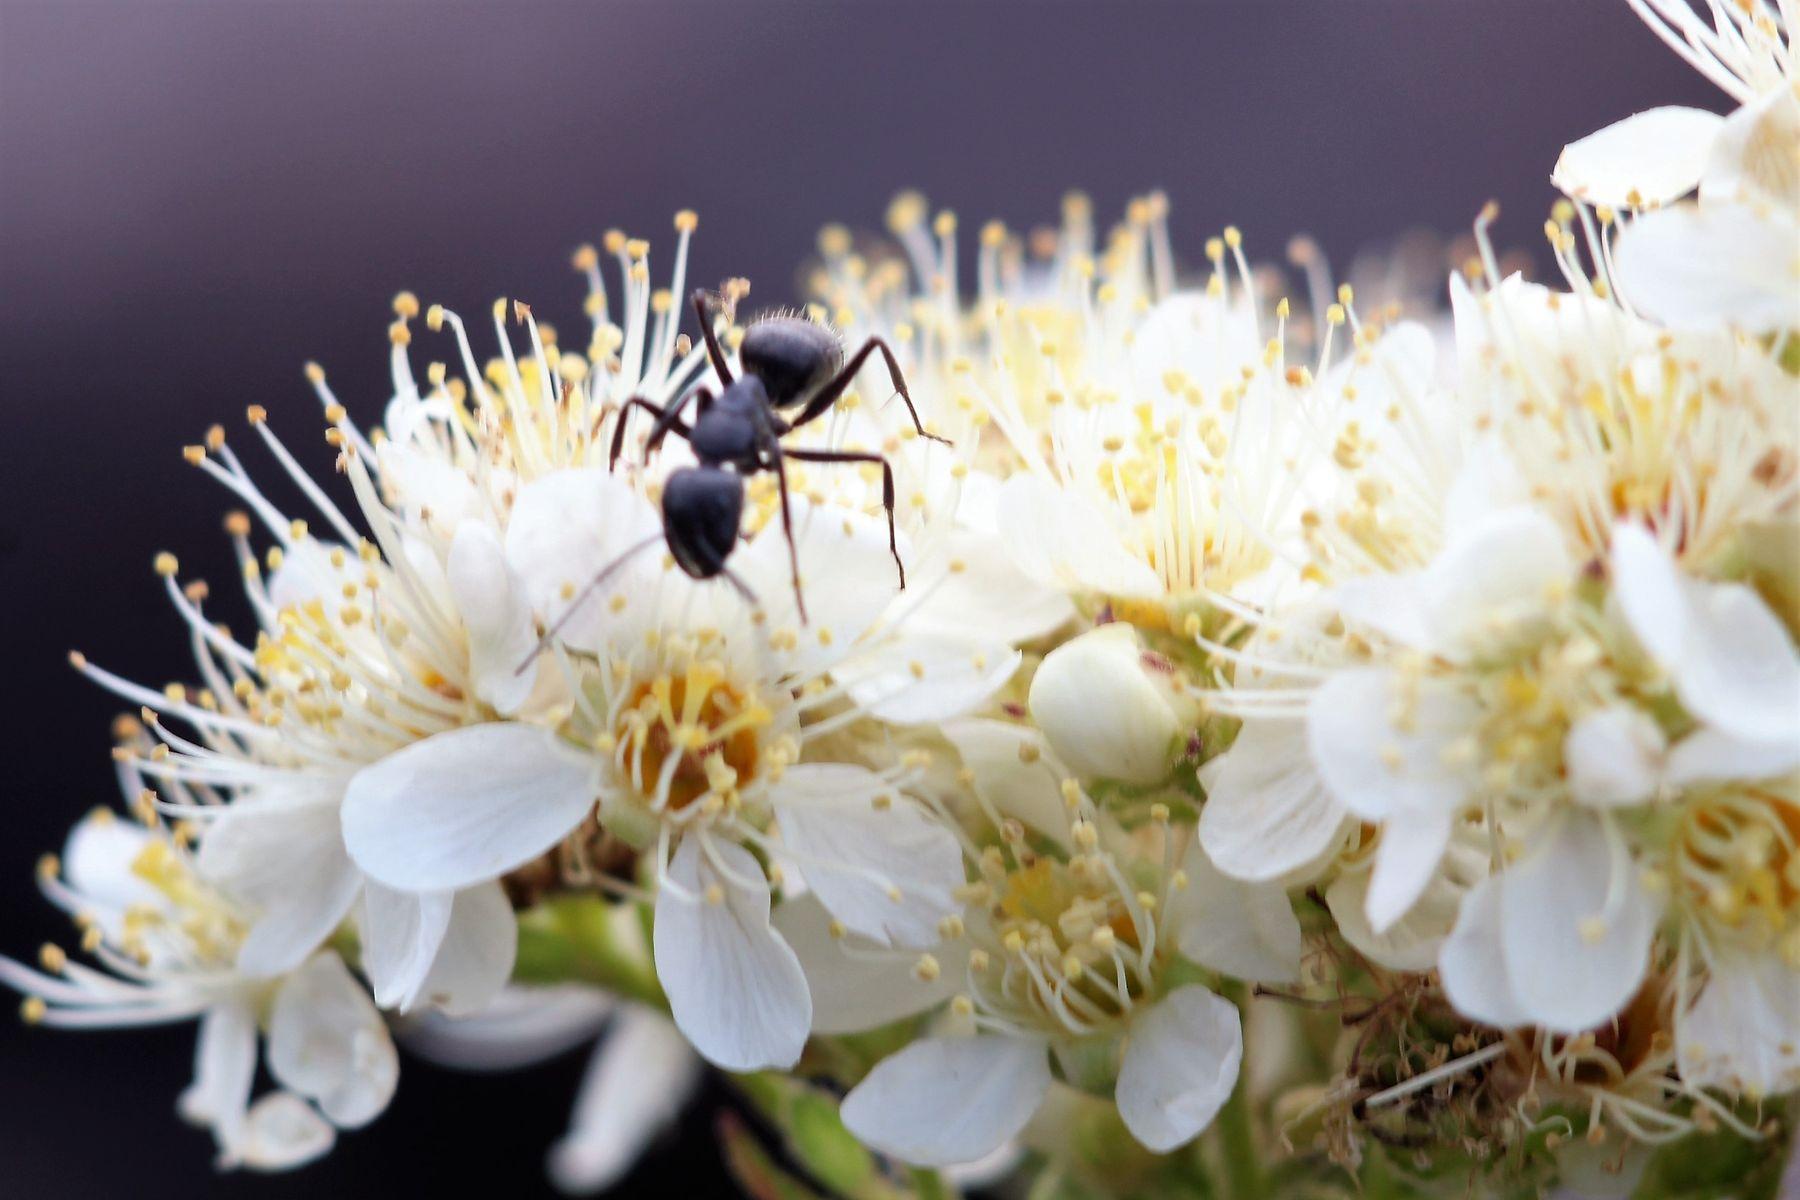 муравьишка природа лето насекомые жара красота